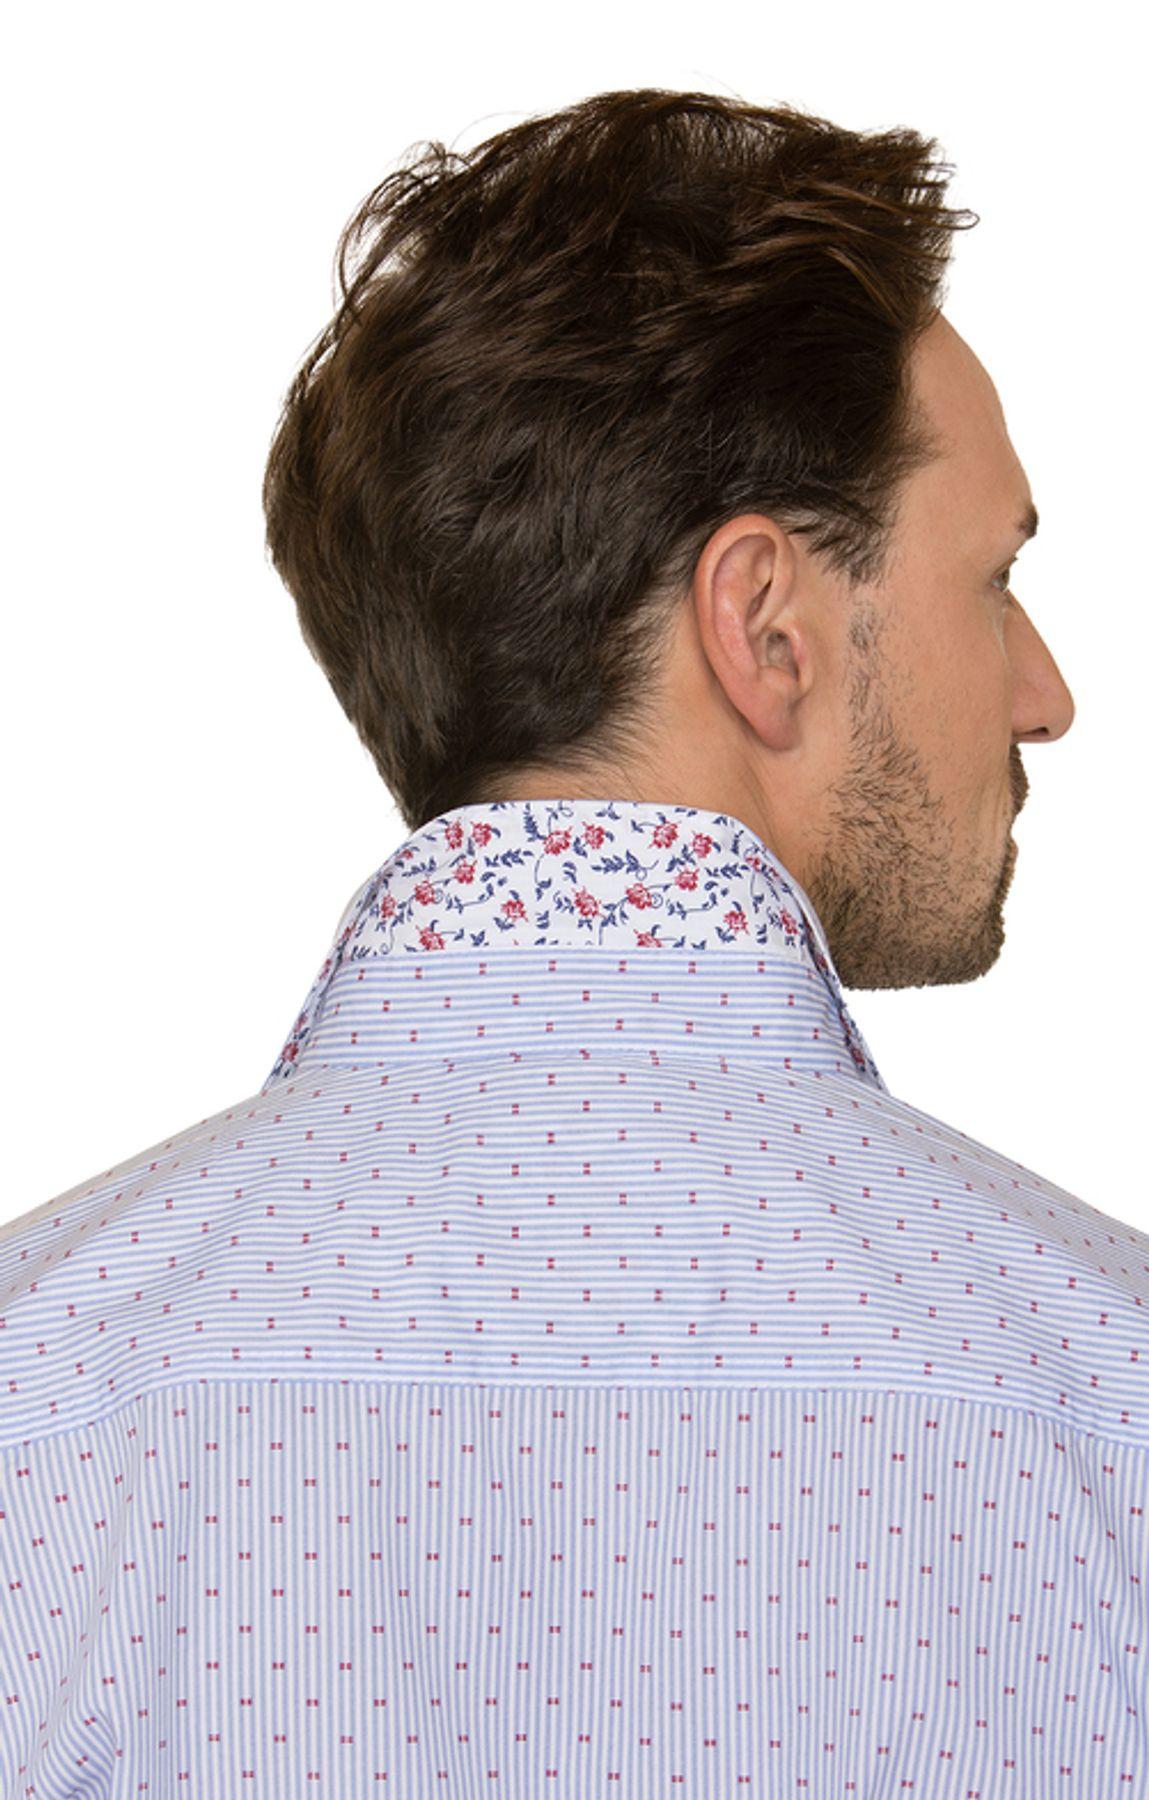 Stockerpoint - Herren Trachtenhemd in Hellblau, Kito – Bild 6